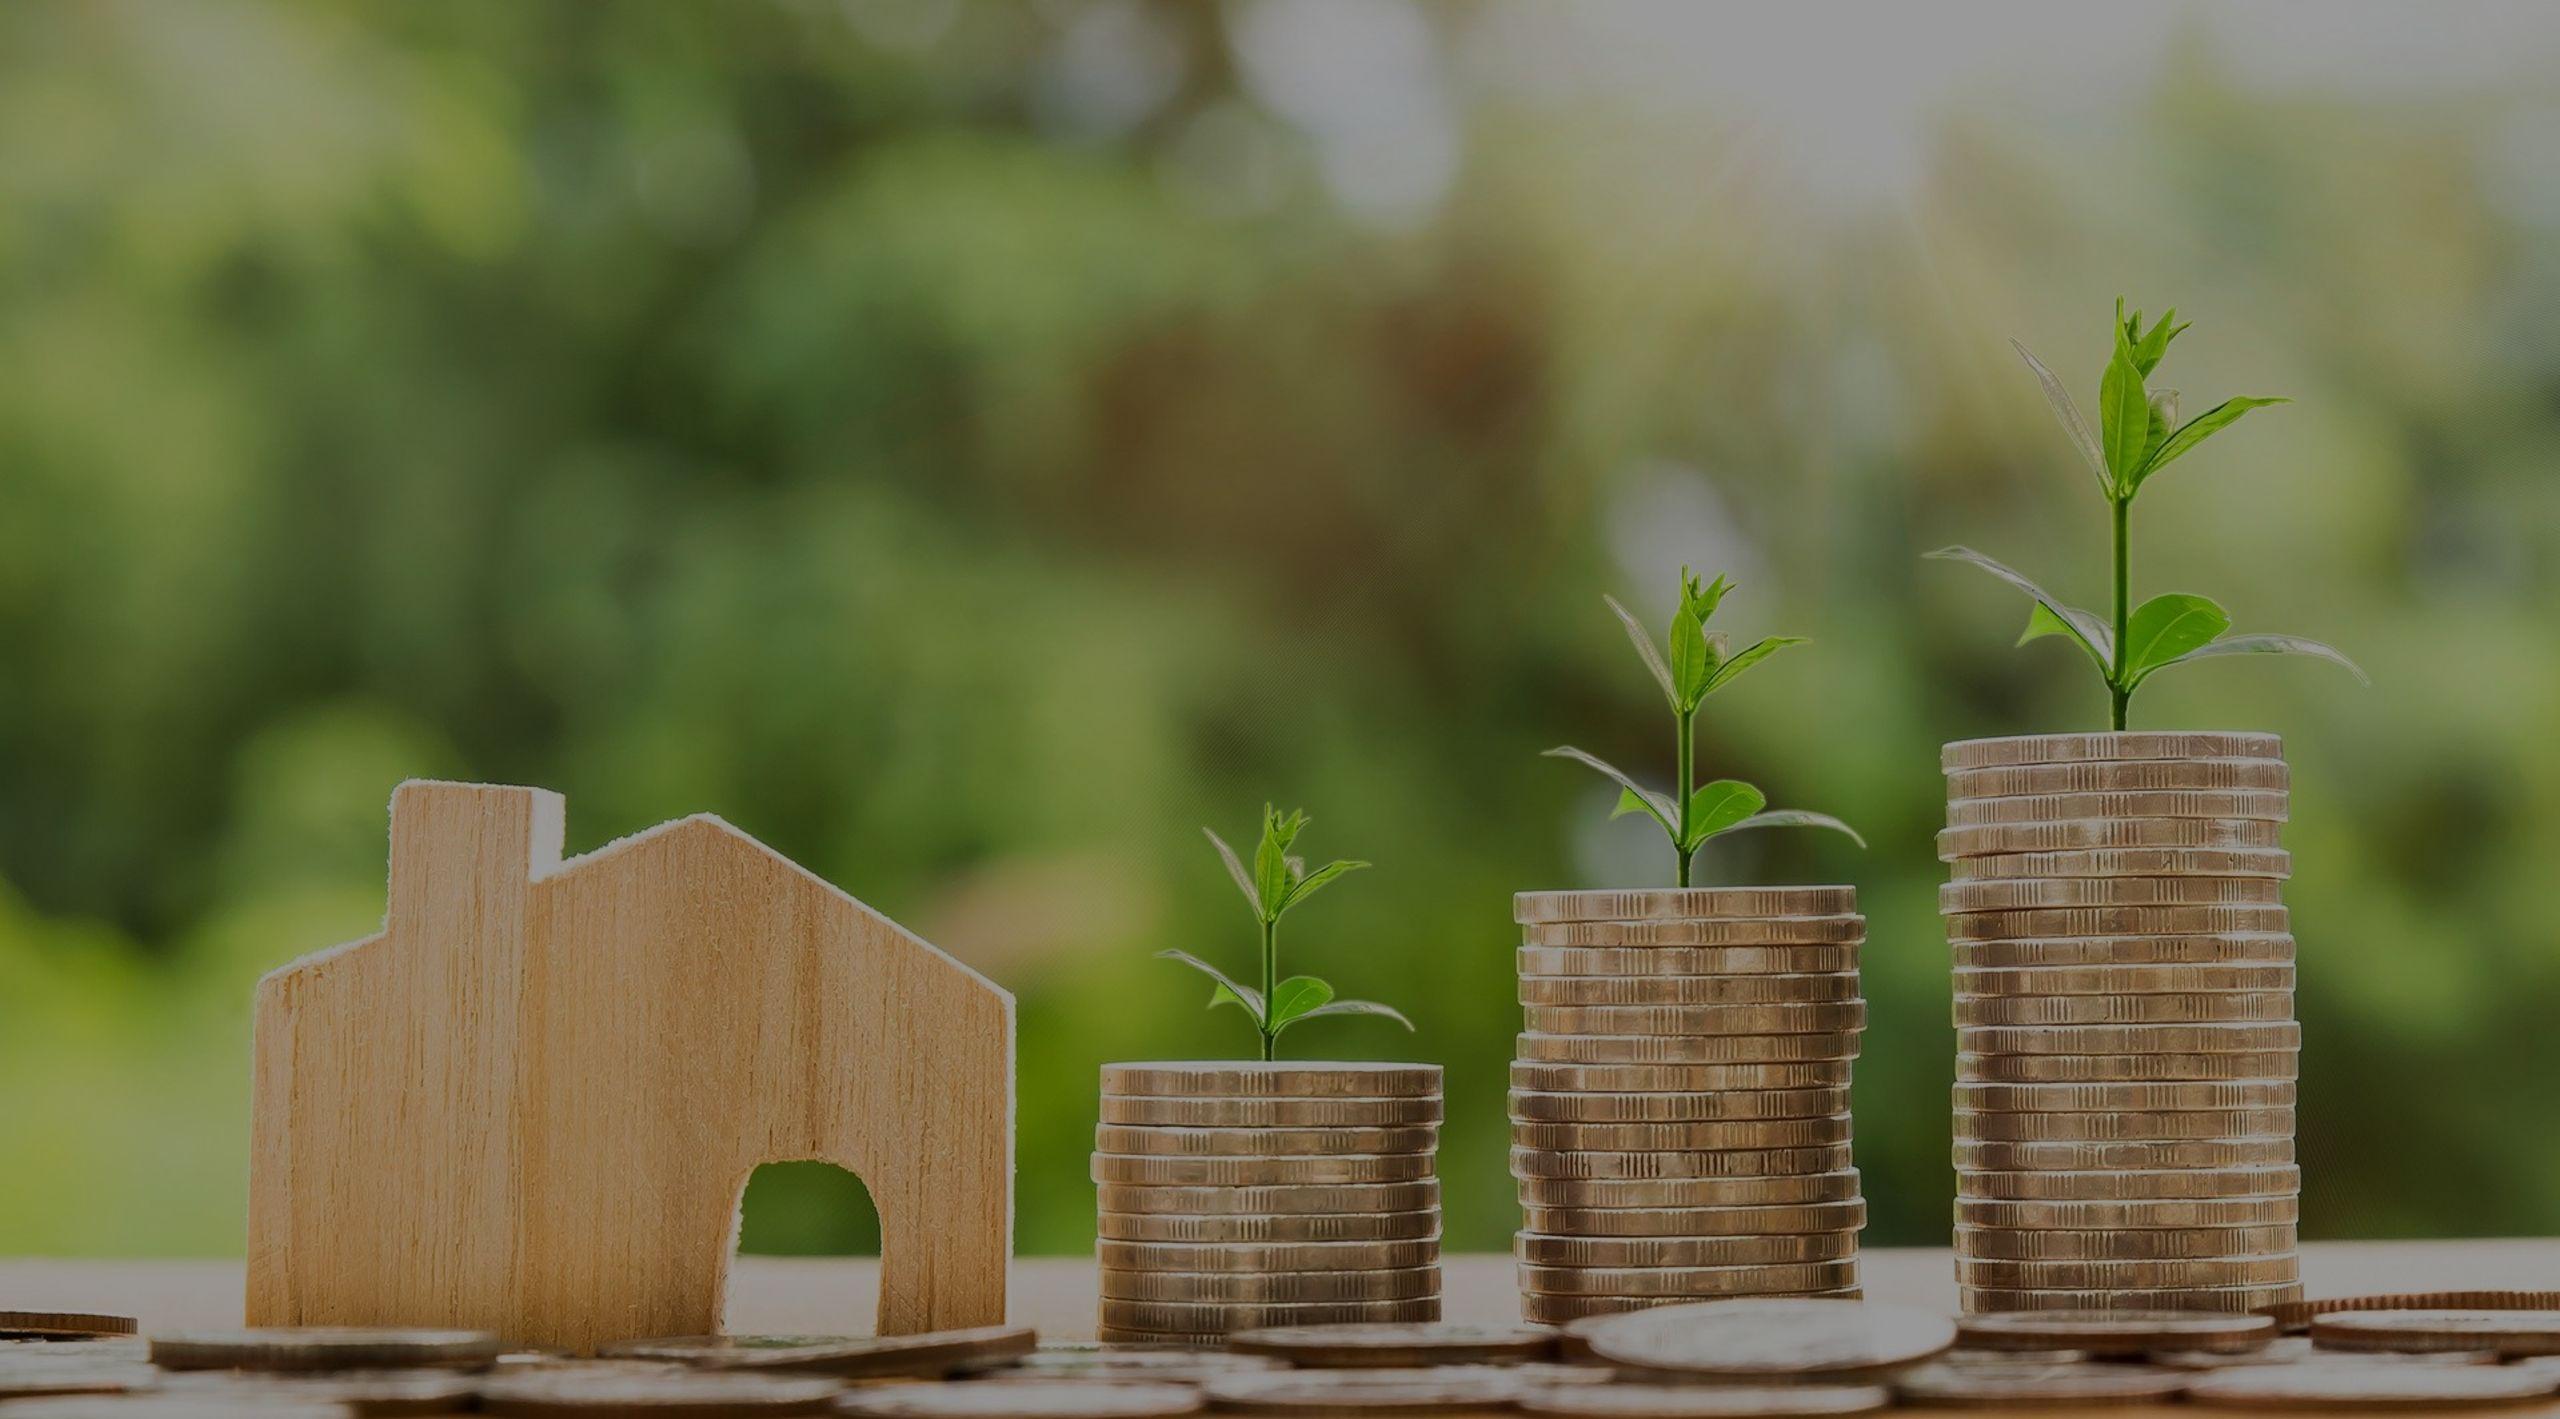 Orlando median home price rises